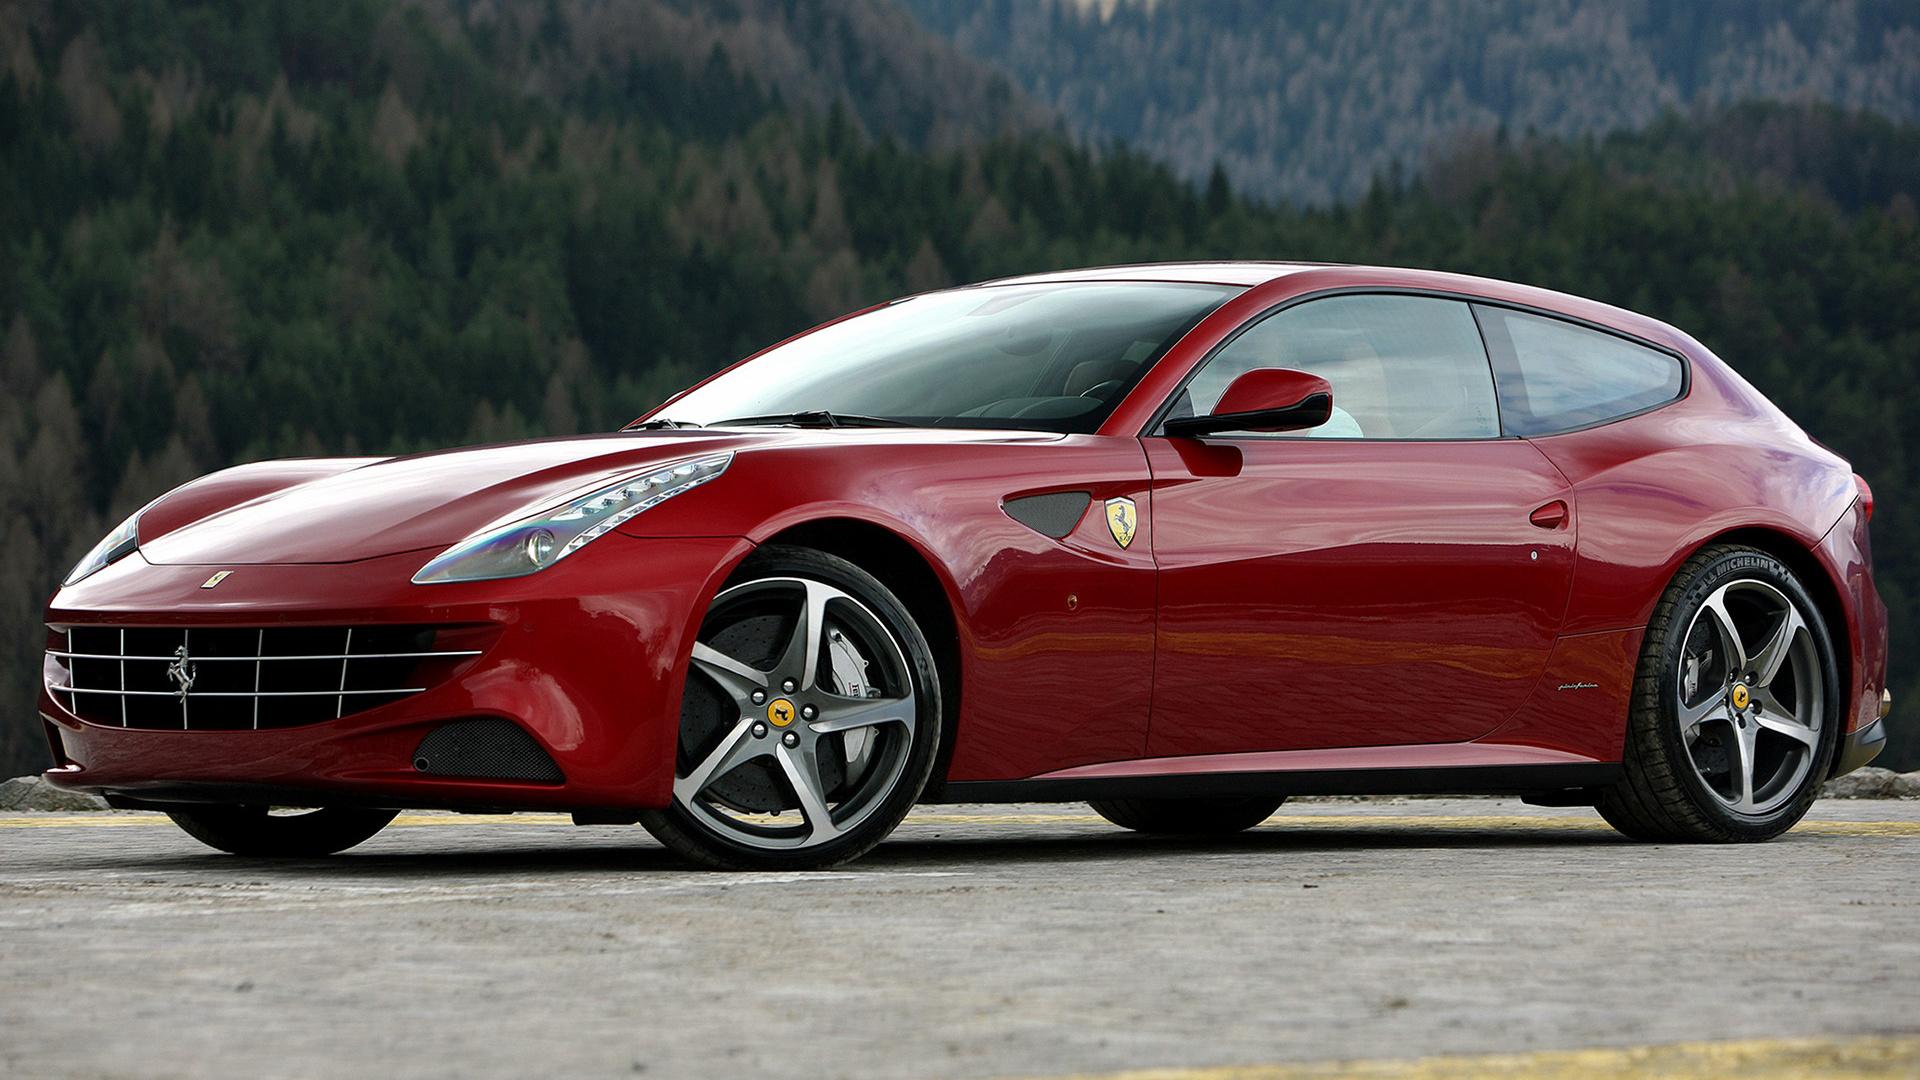 2011 Ferrari Ff Wallpapers And Hd Images Car Pixel